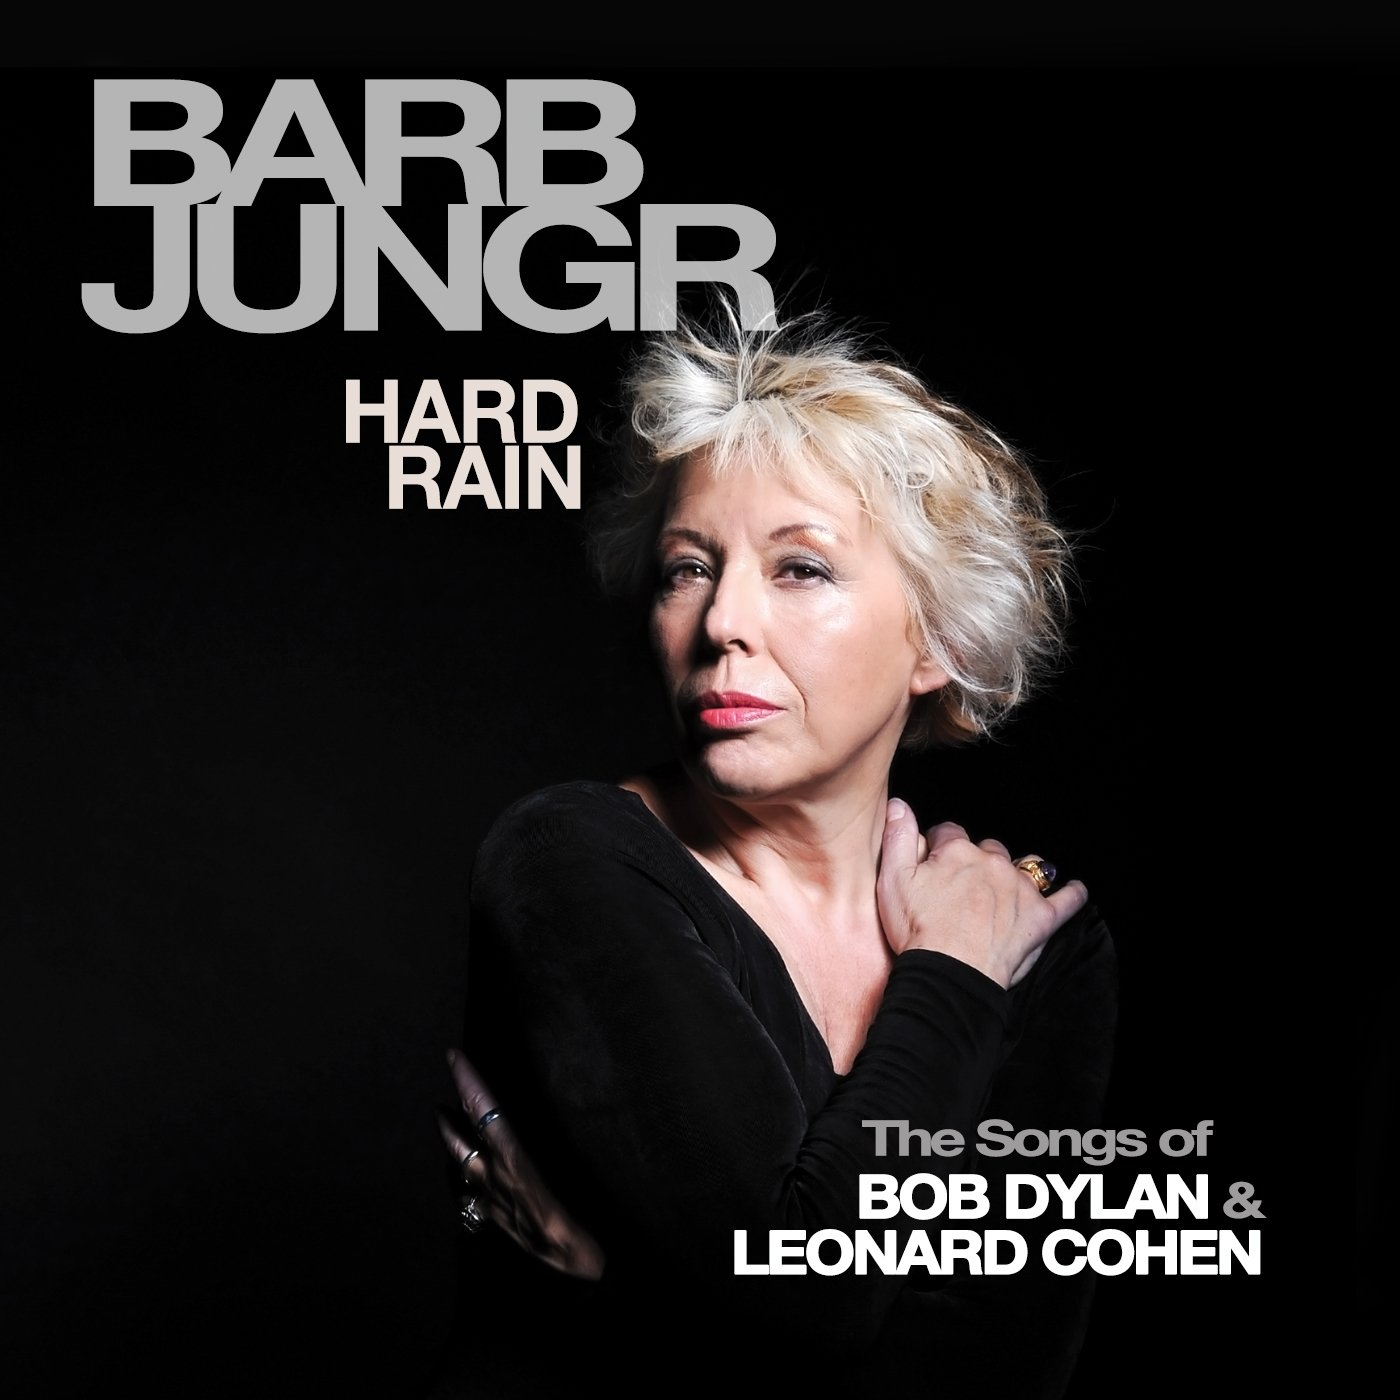 Hard Rain - The Songs of Bob Dylan & Leonard Cohen Barb Jungr